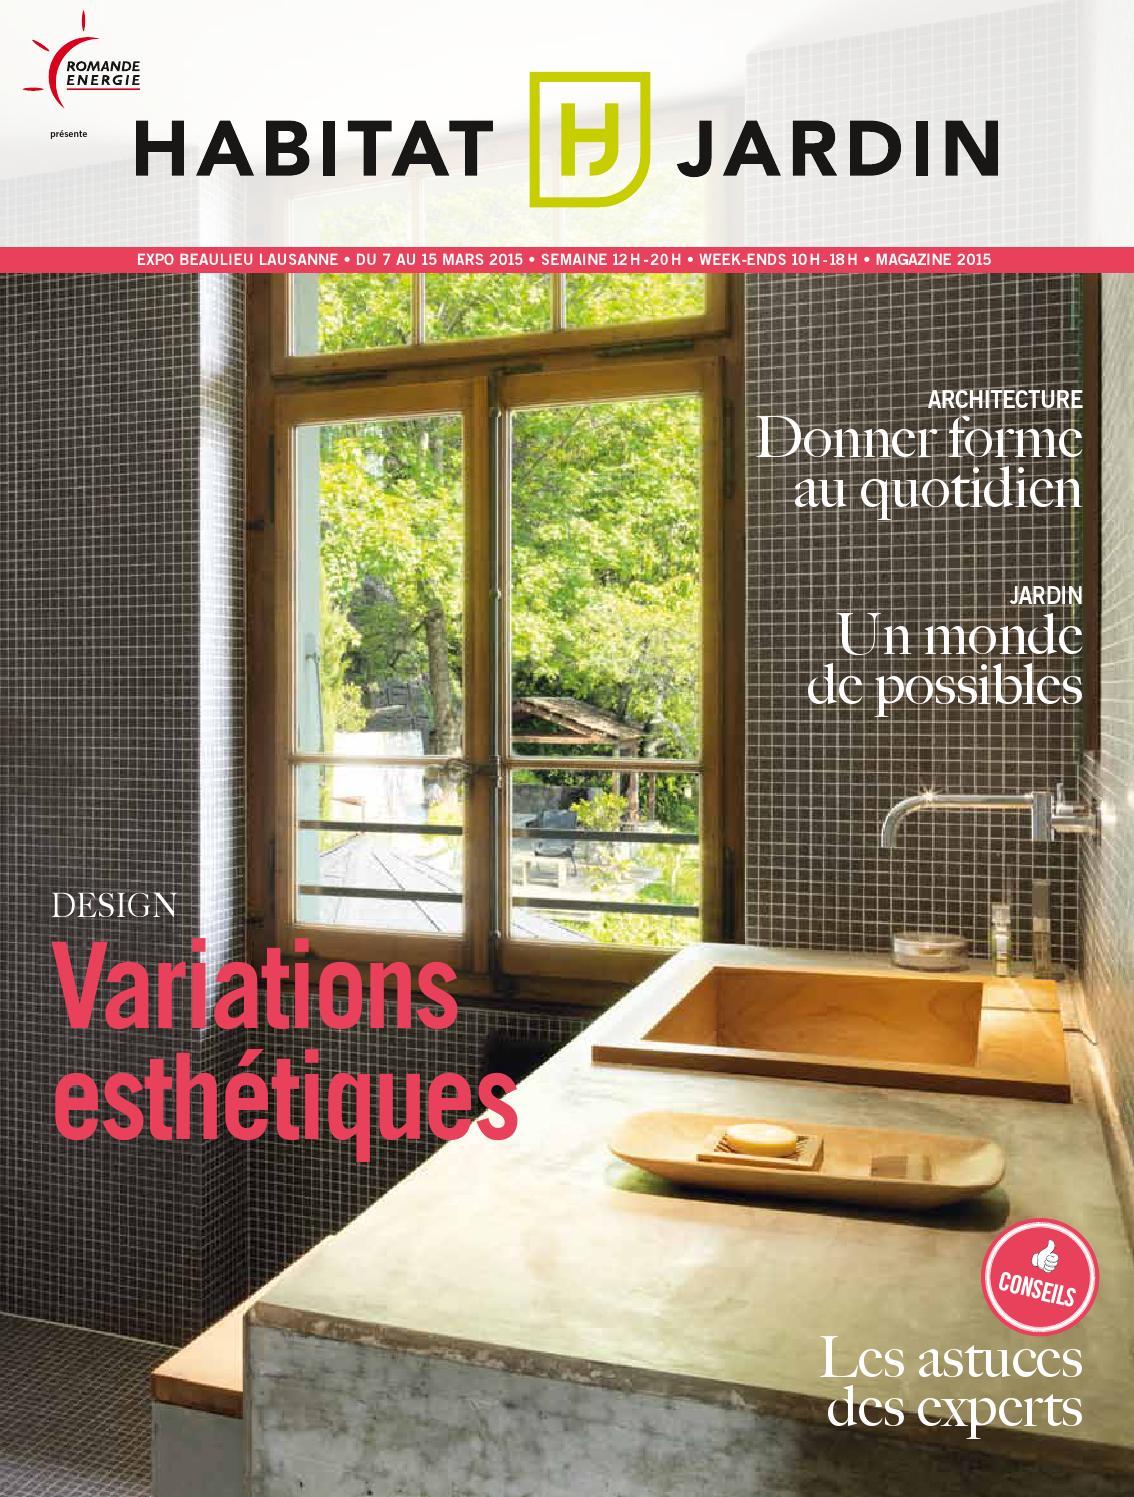 Habitat jardin 2015 magazine by in dit publications sa issuu for Habitat jardin 2015